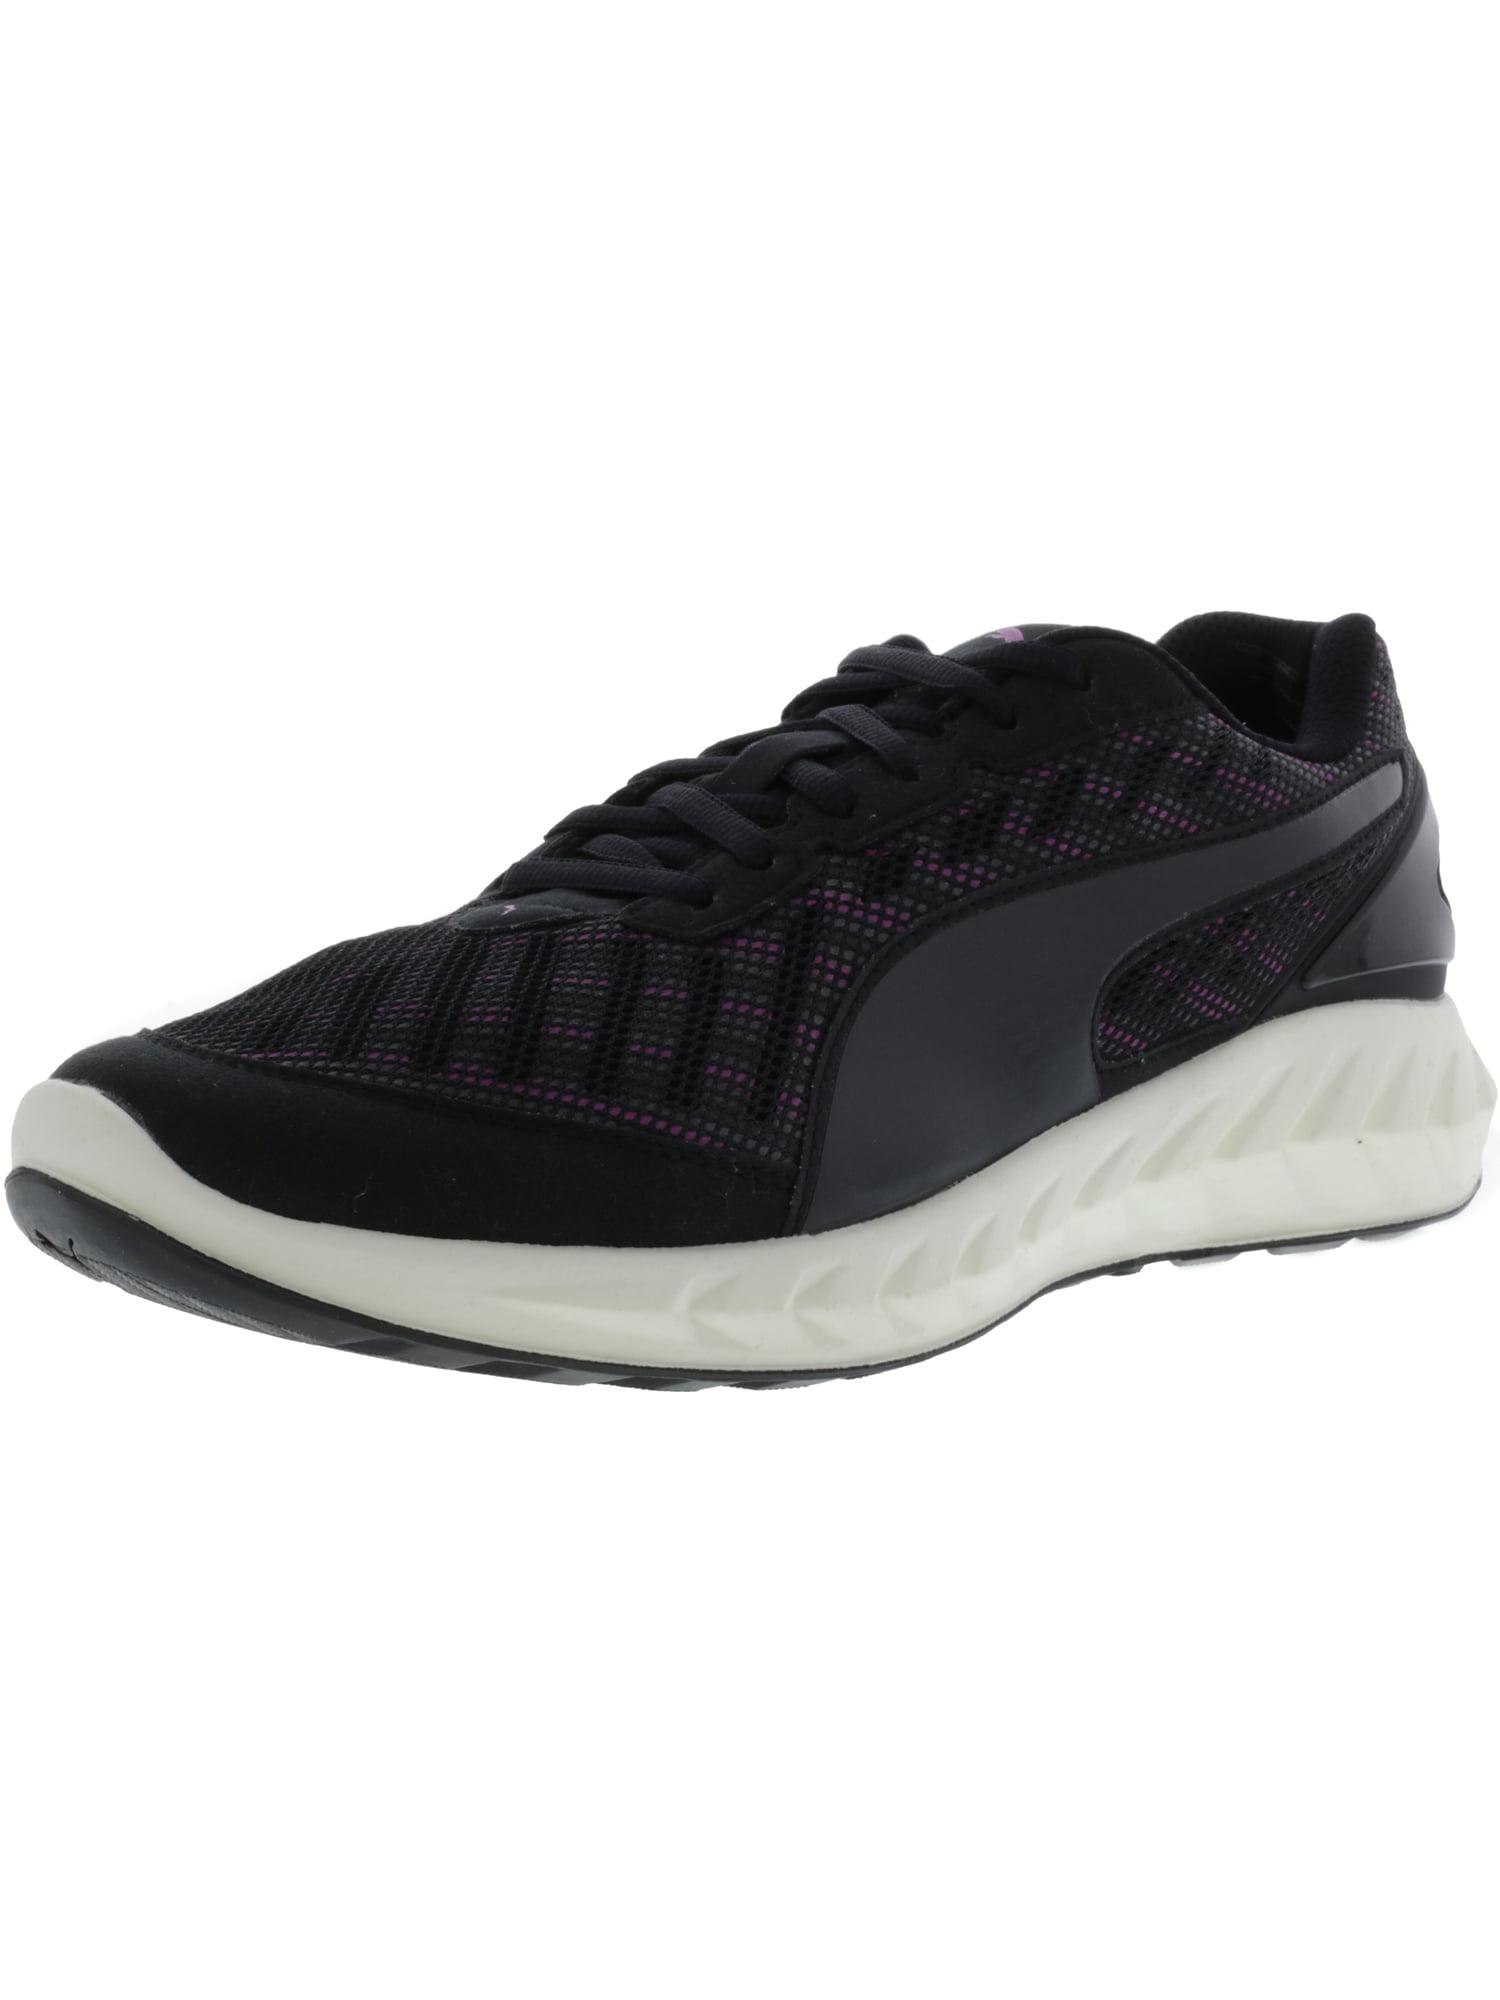 Puma Women's Ignite Ultimate Multi Black Ankle-High Fabric Running Shoe - 9M